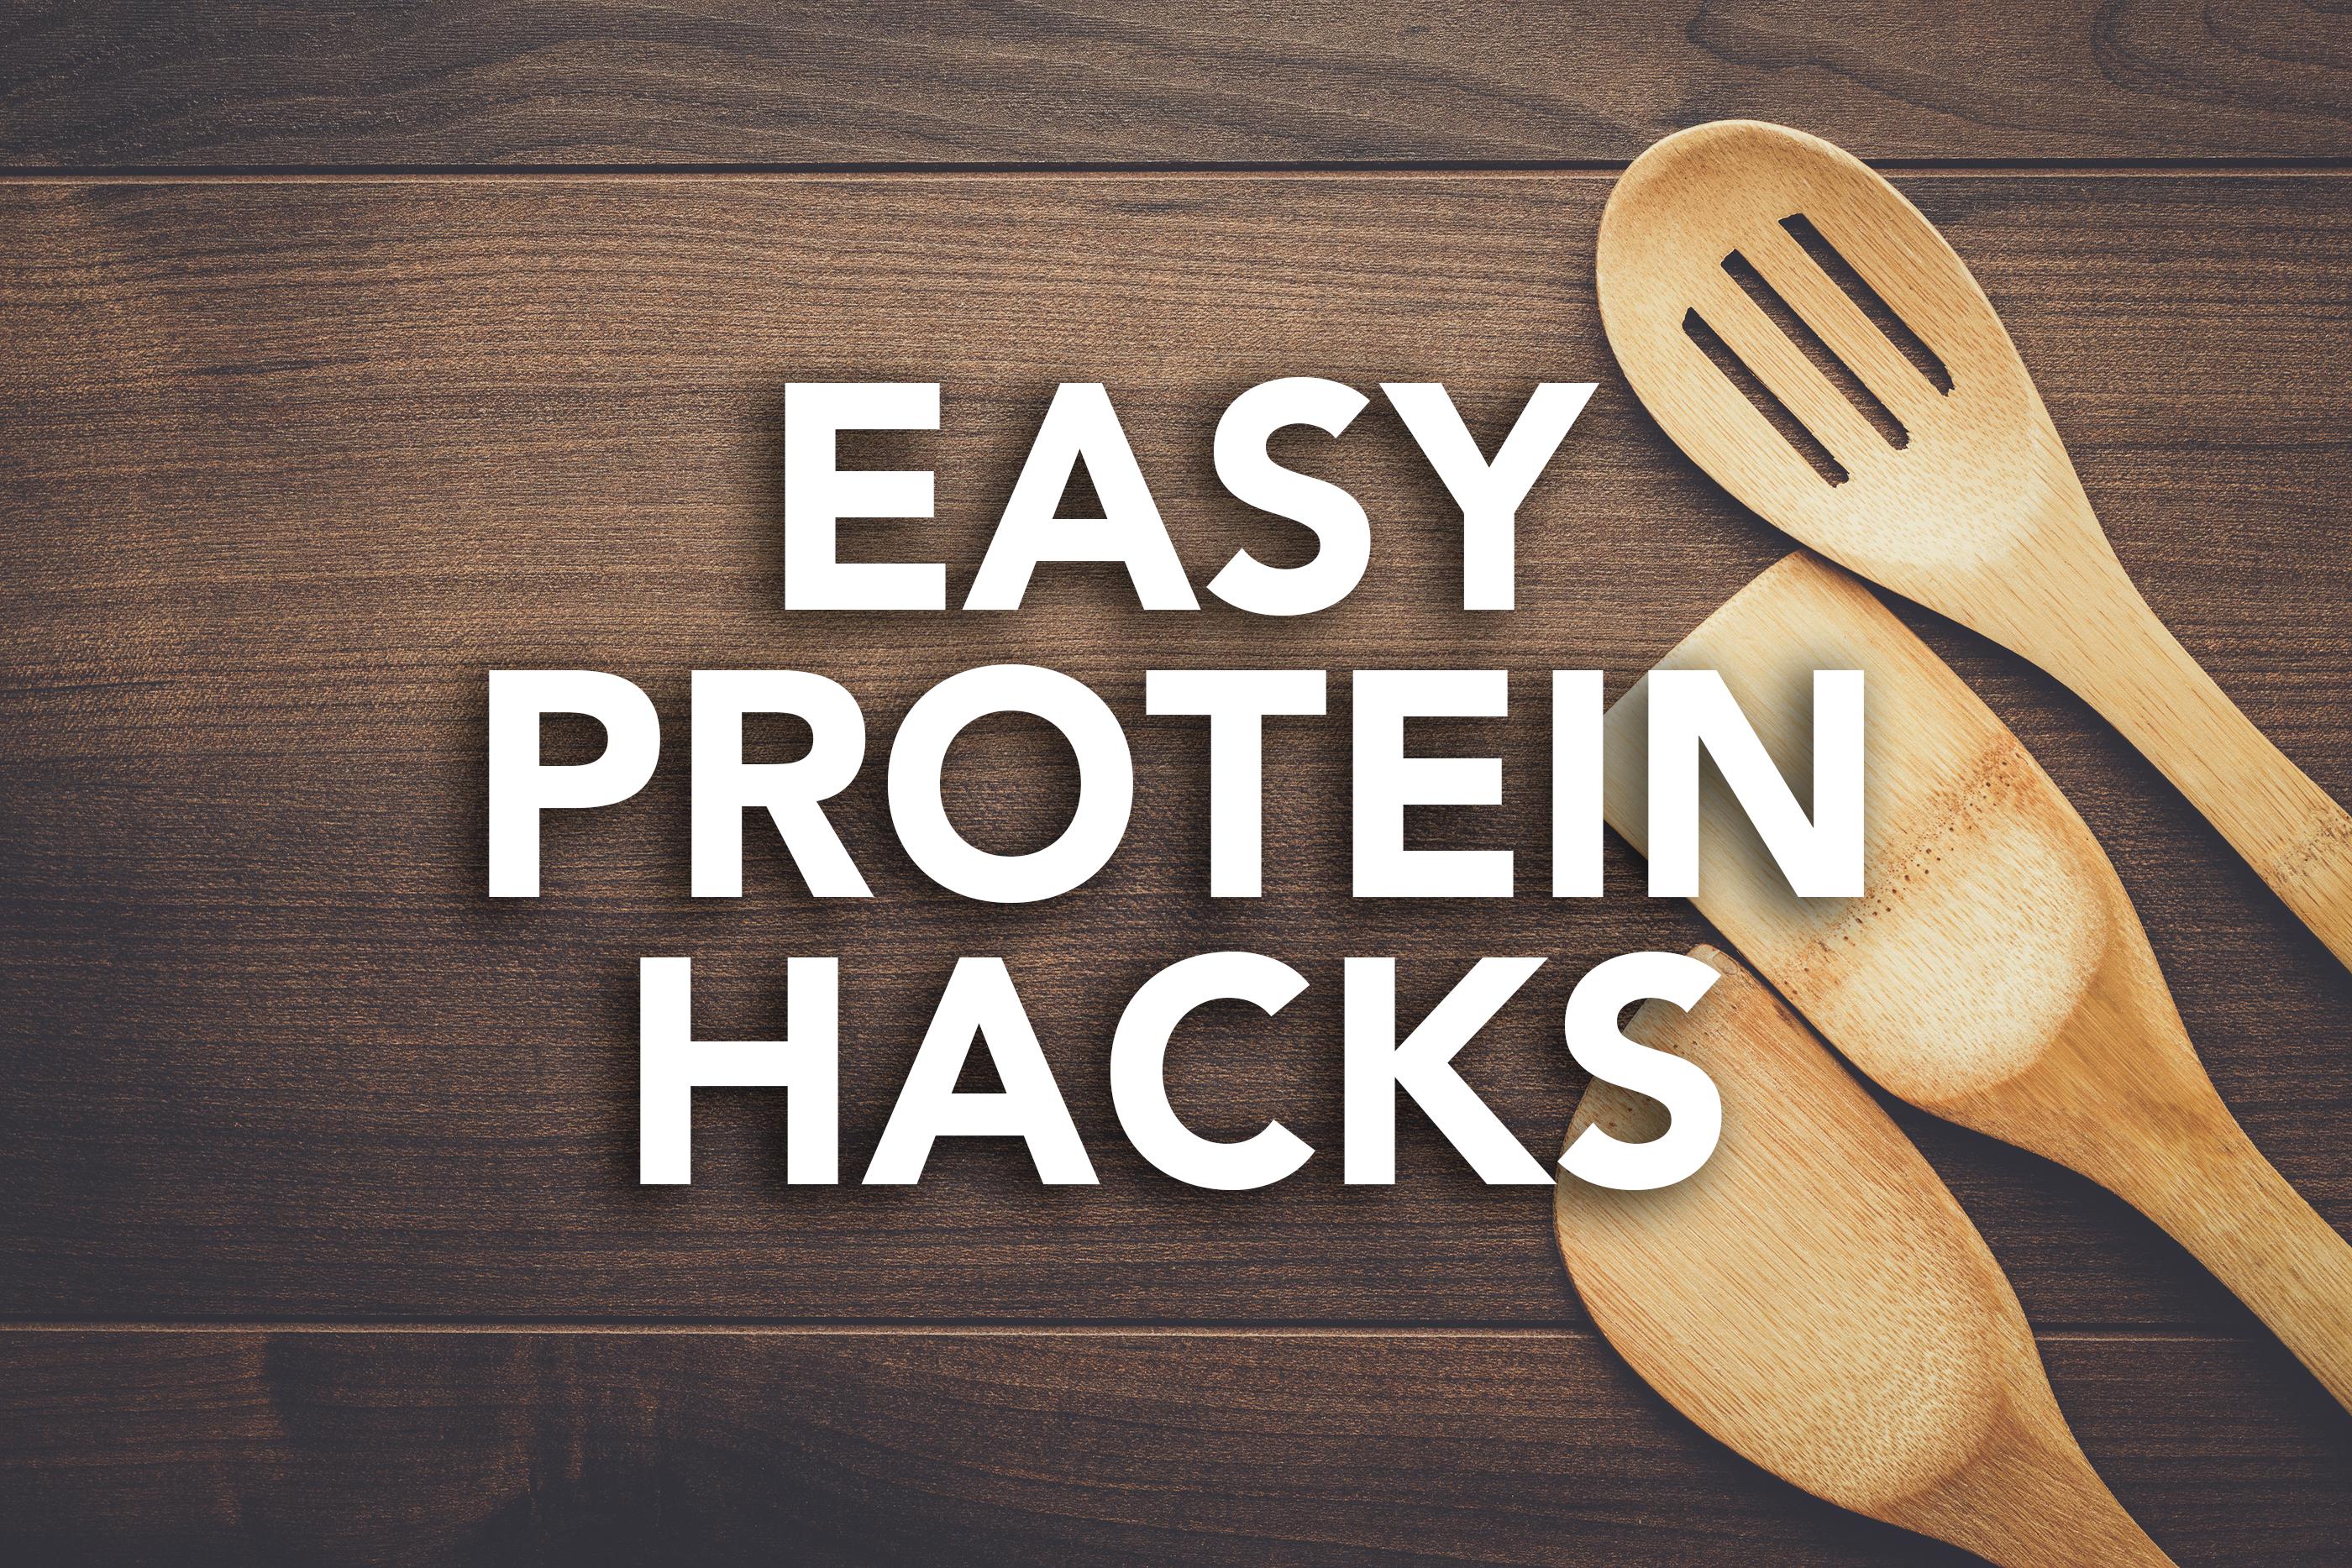 Easy Protein Hacks